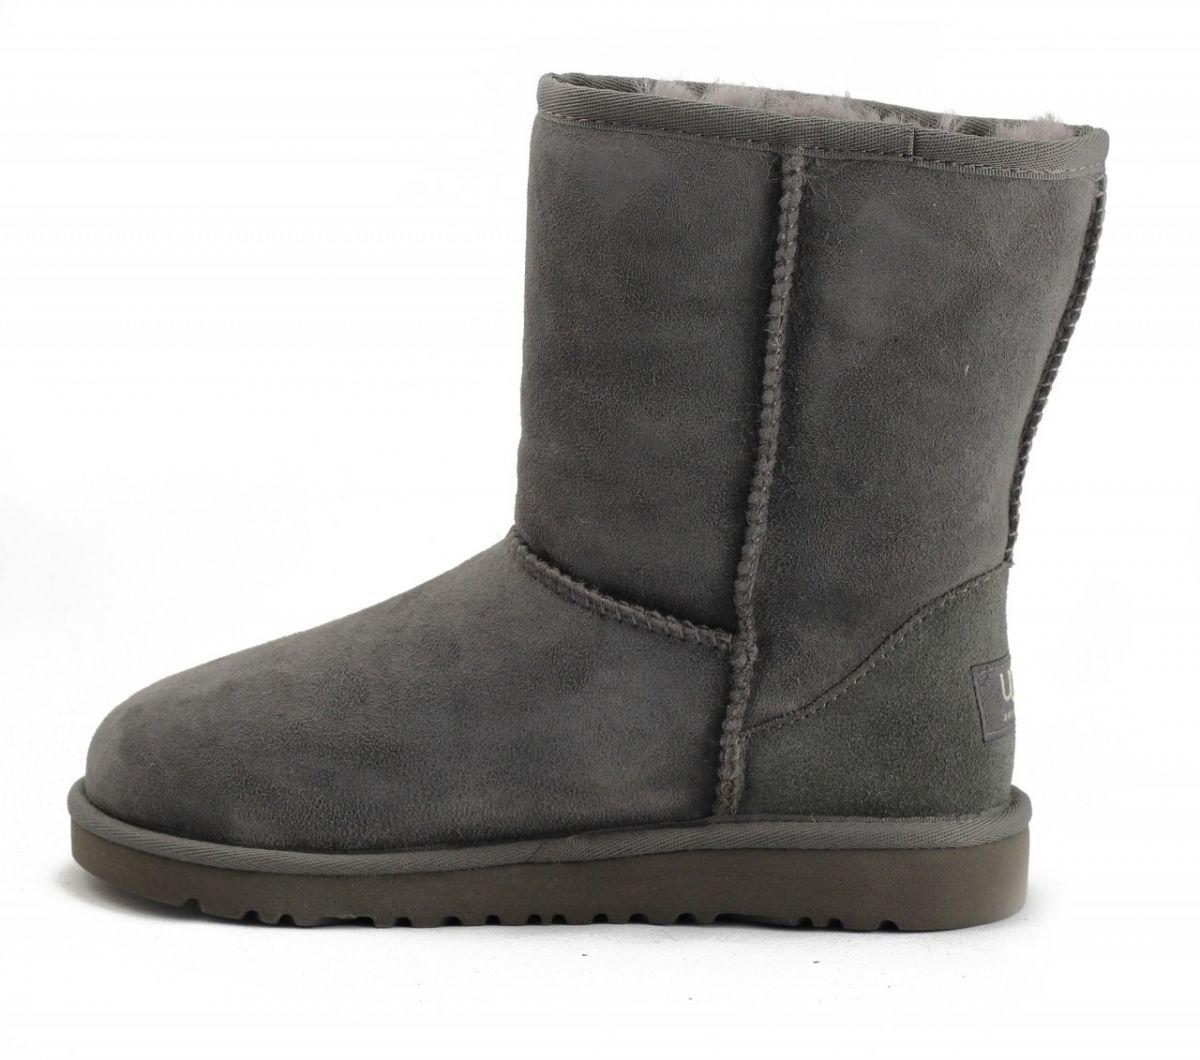 e7a6b7de710 UGG Australia for Kids: Classic Short Grey Boots Grey